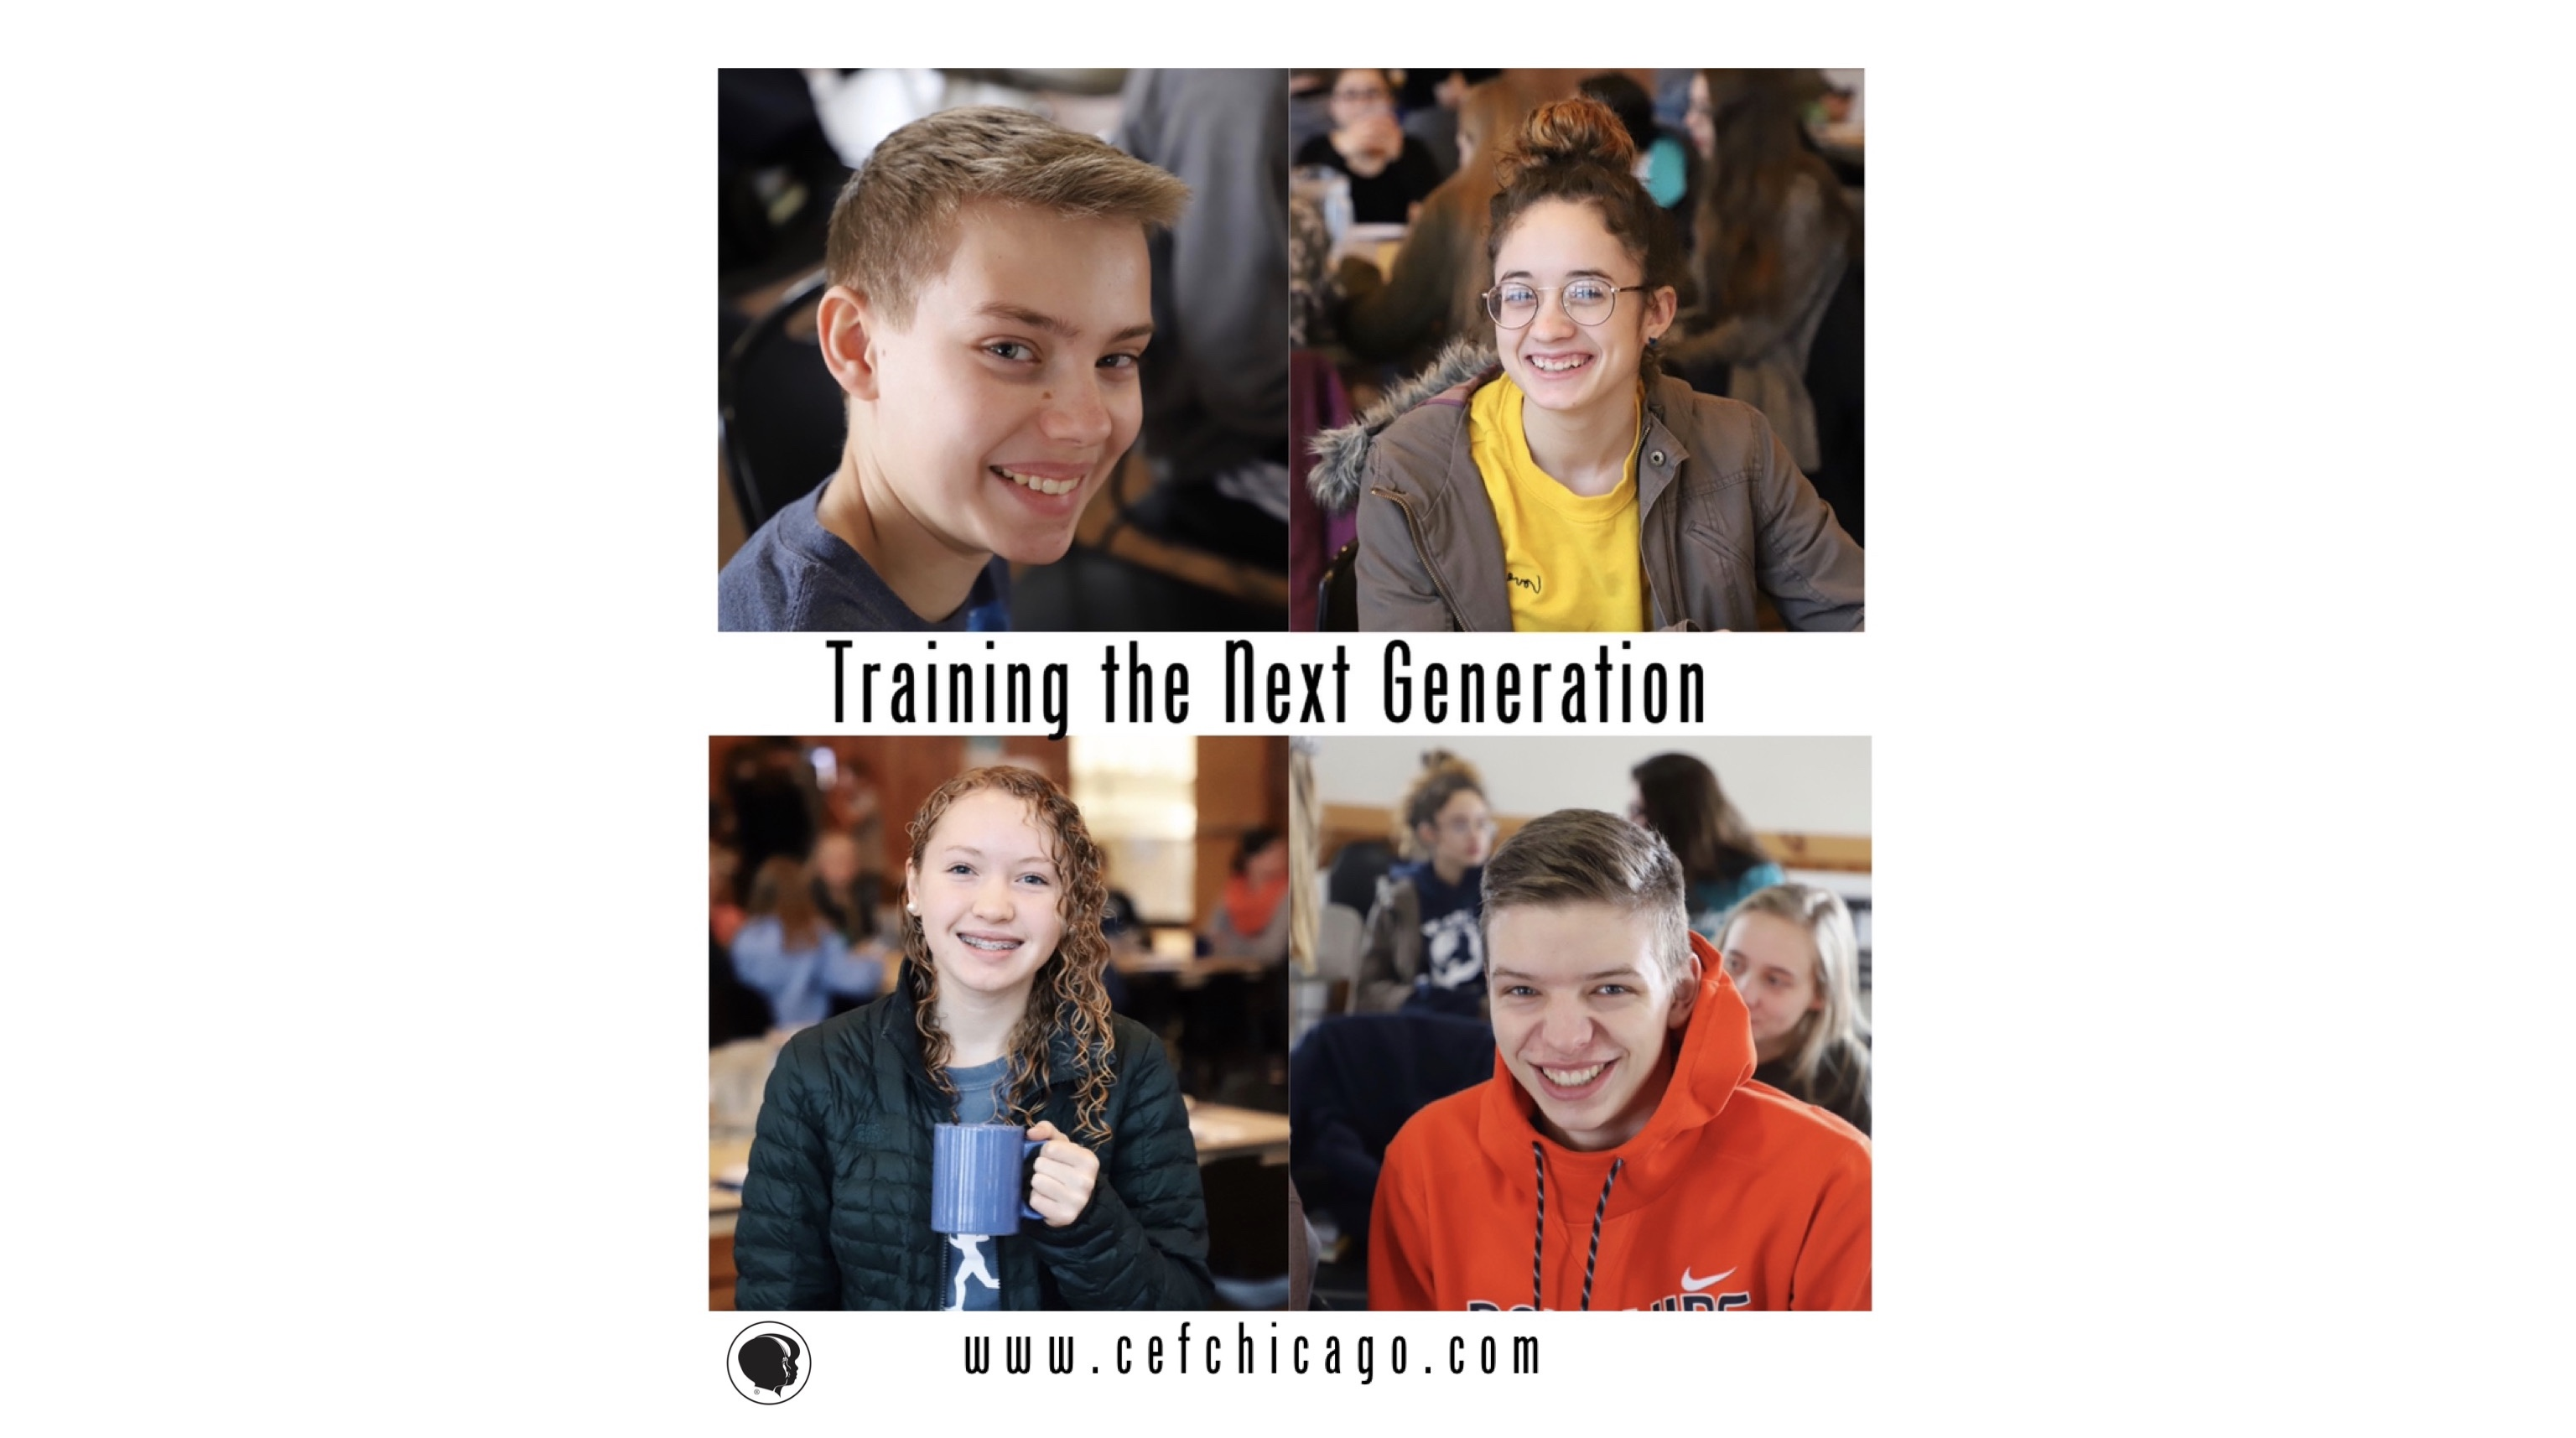 Training the Next Generation